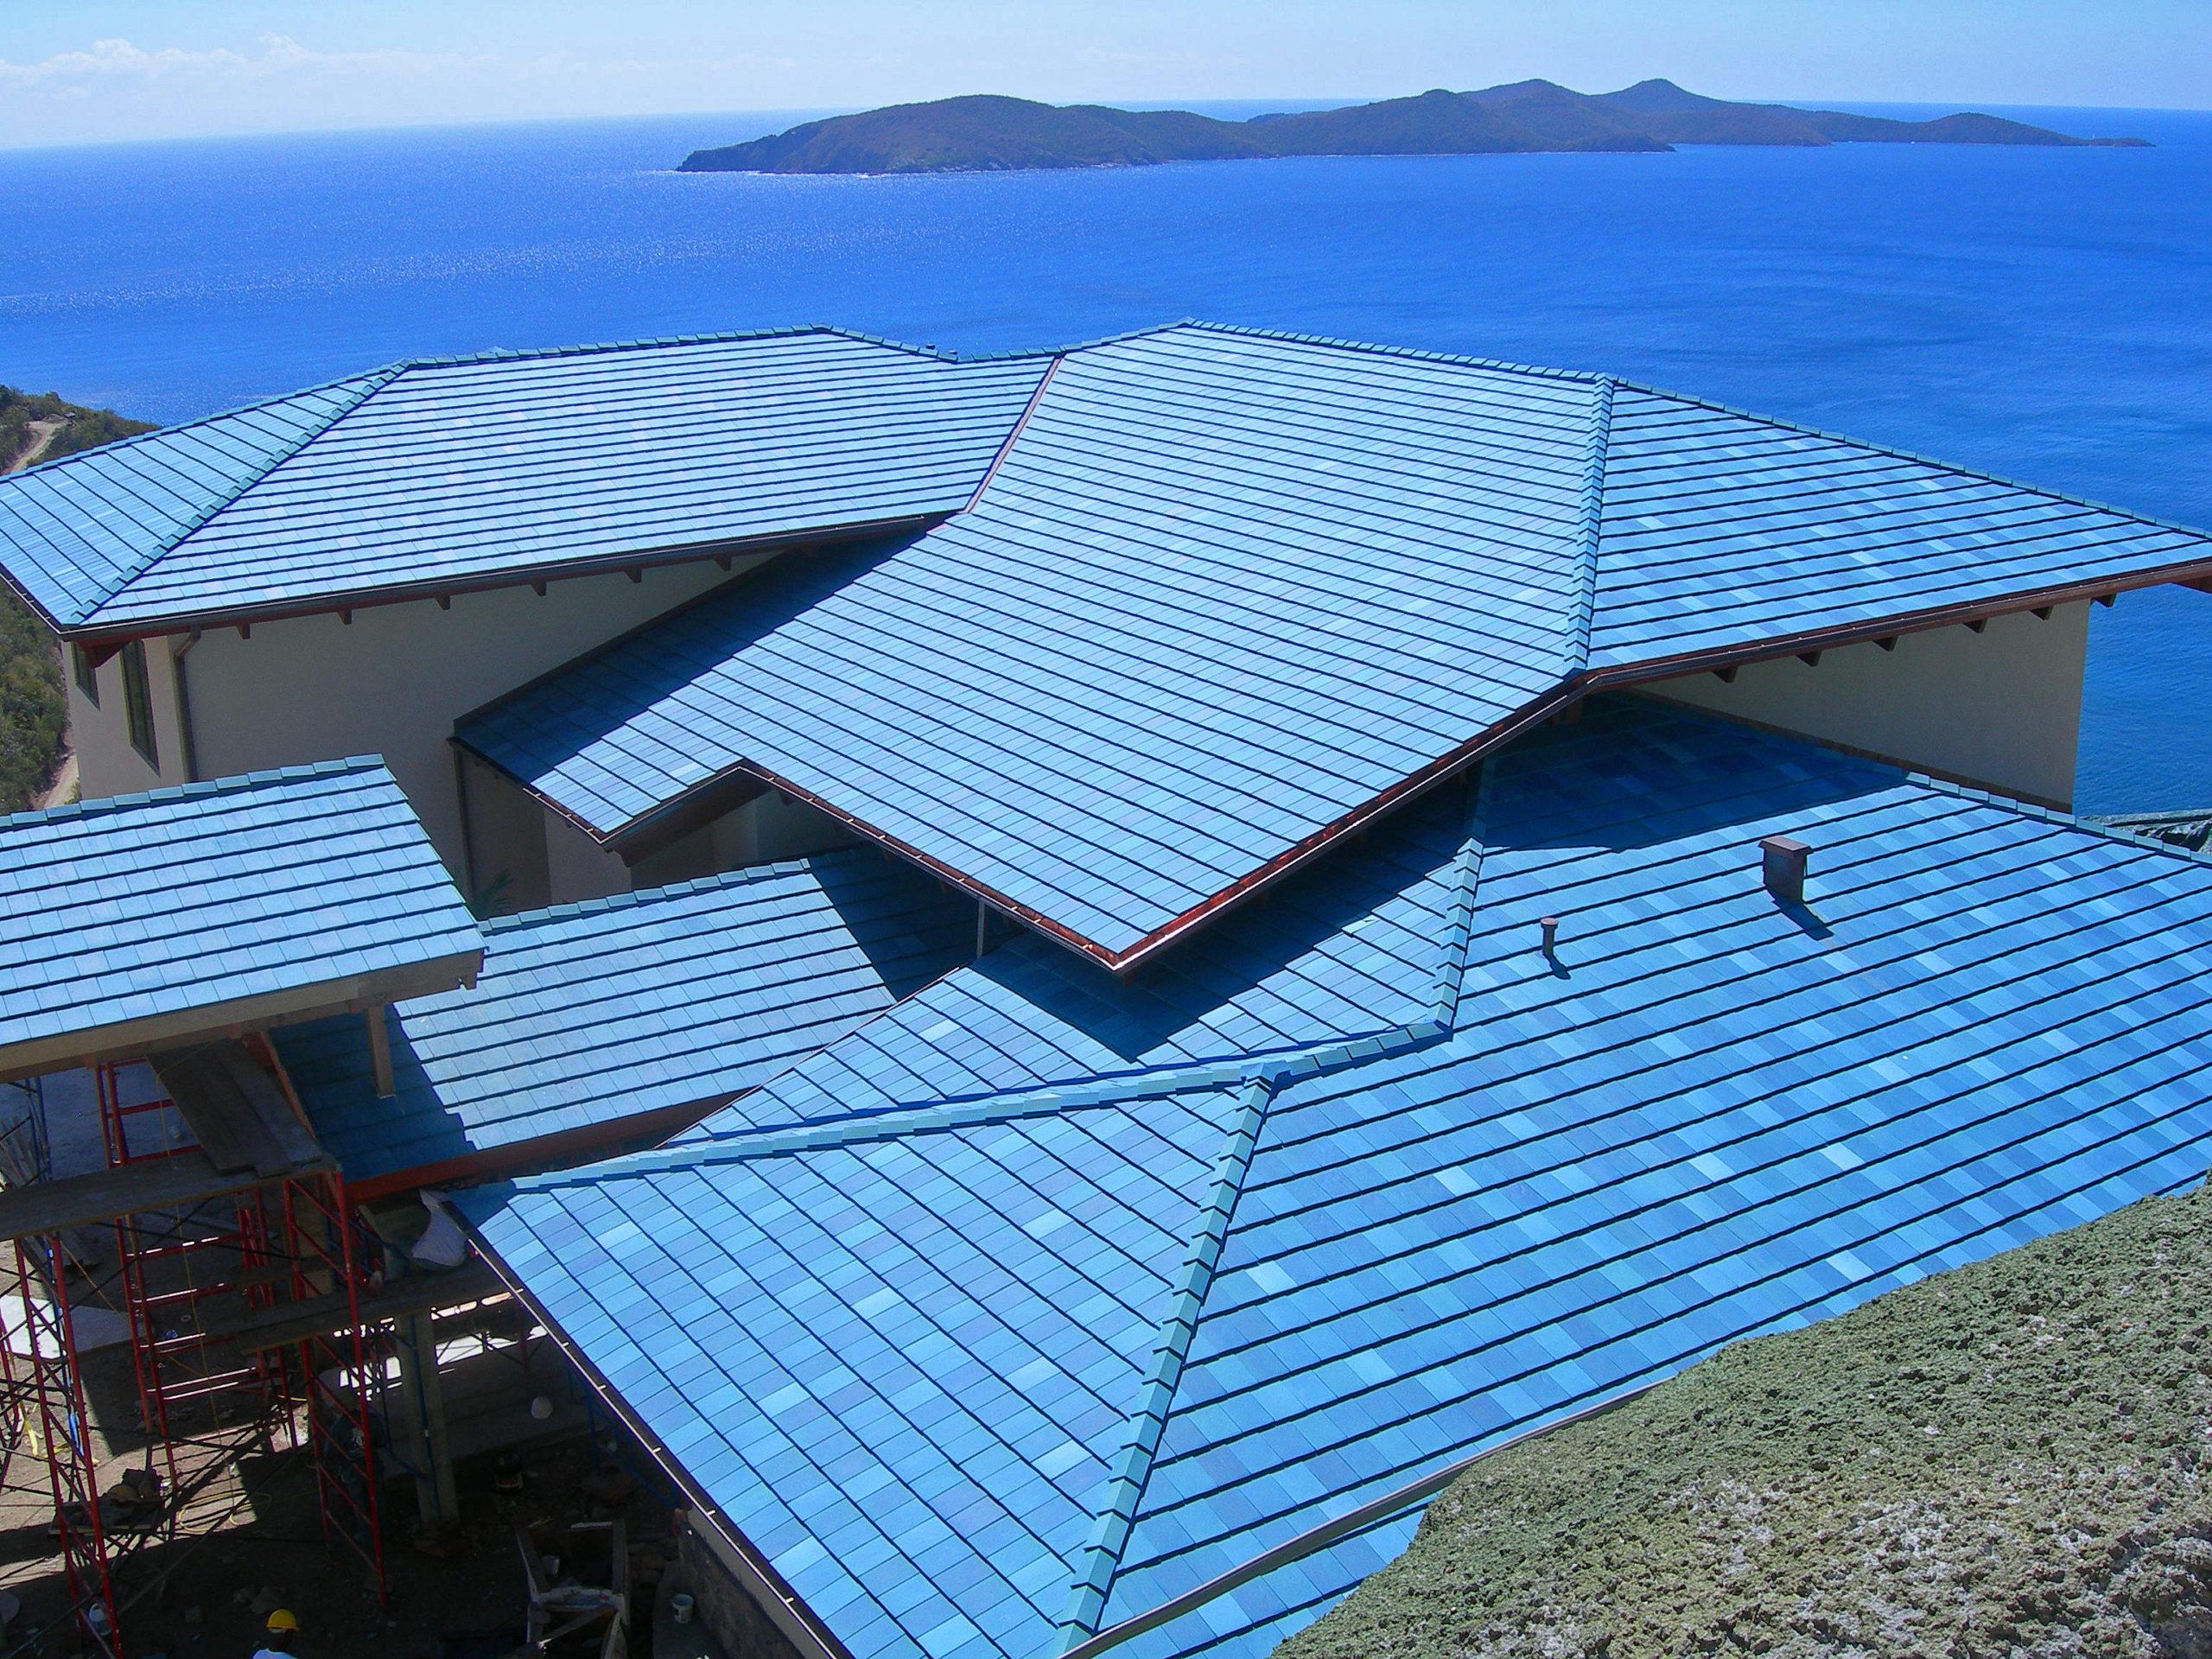 Falcon's Nest, Peter Island Resort & Spa Ludowici Roof Tile